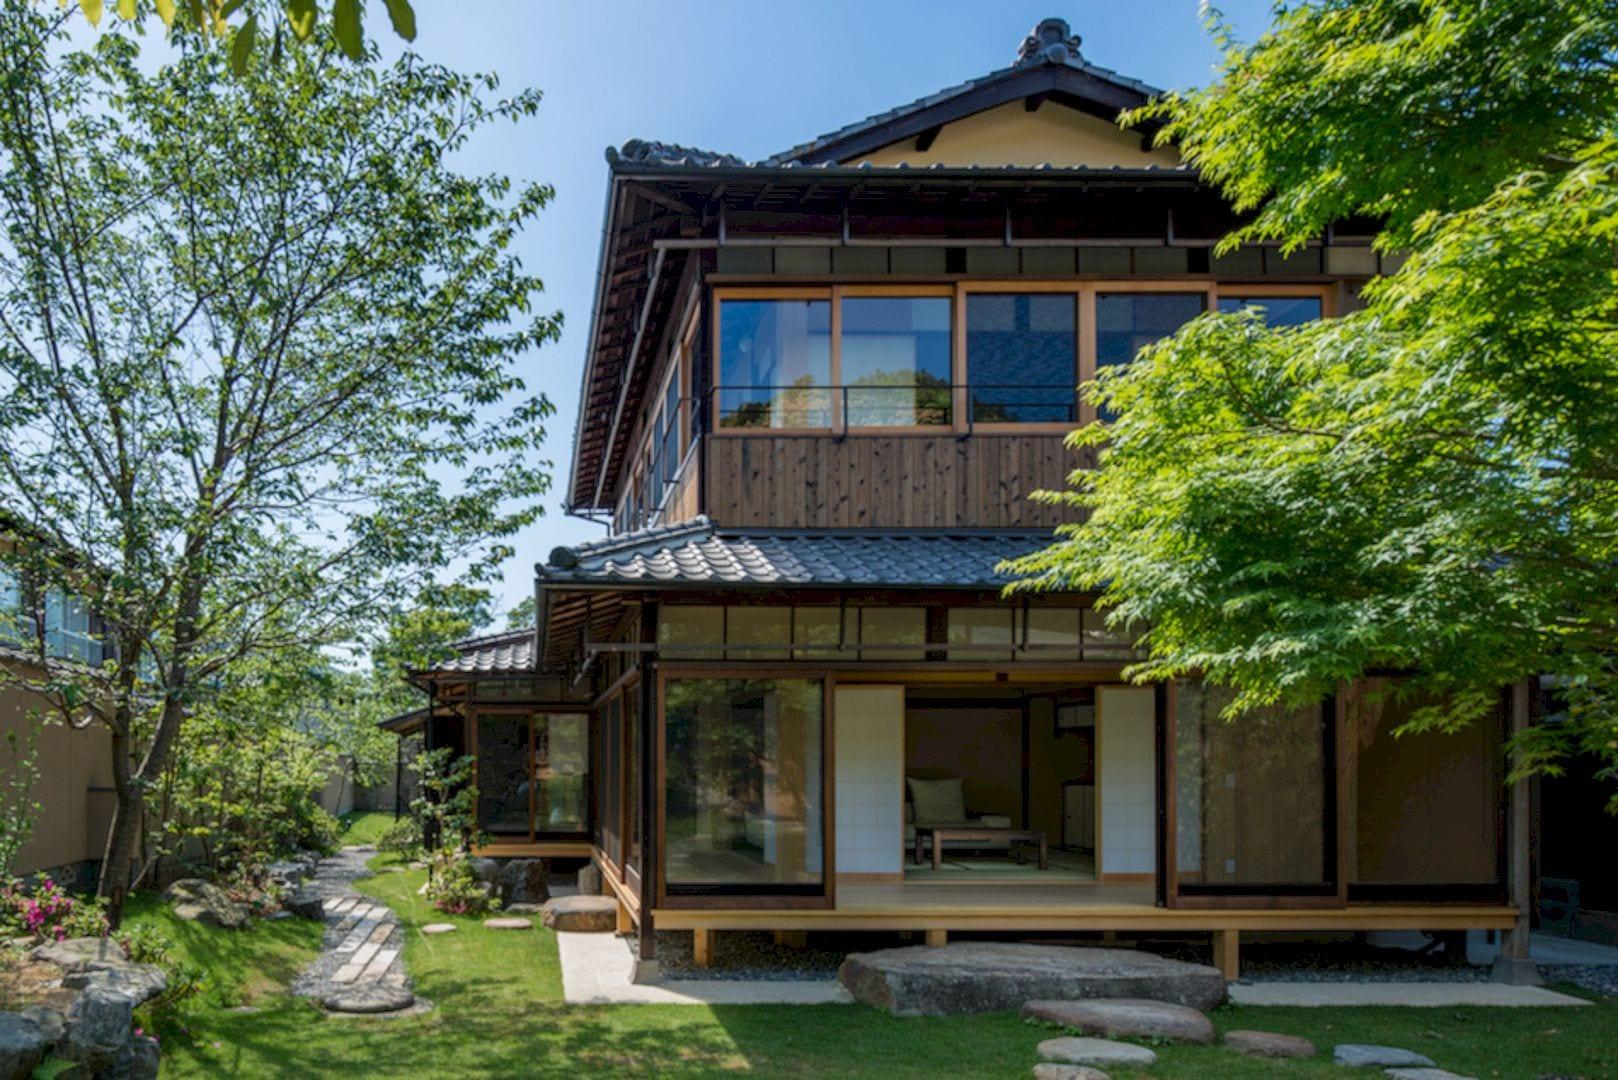 House In Shishigatani By Kazuya Morita Architecture Studio 15